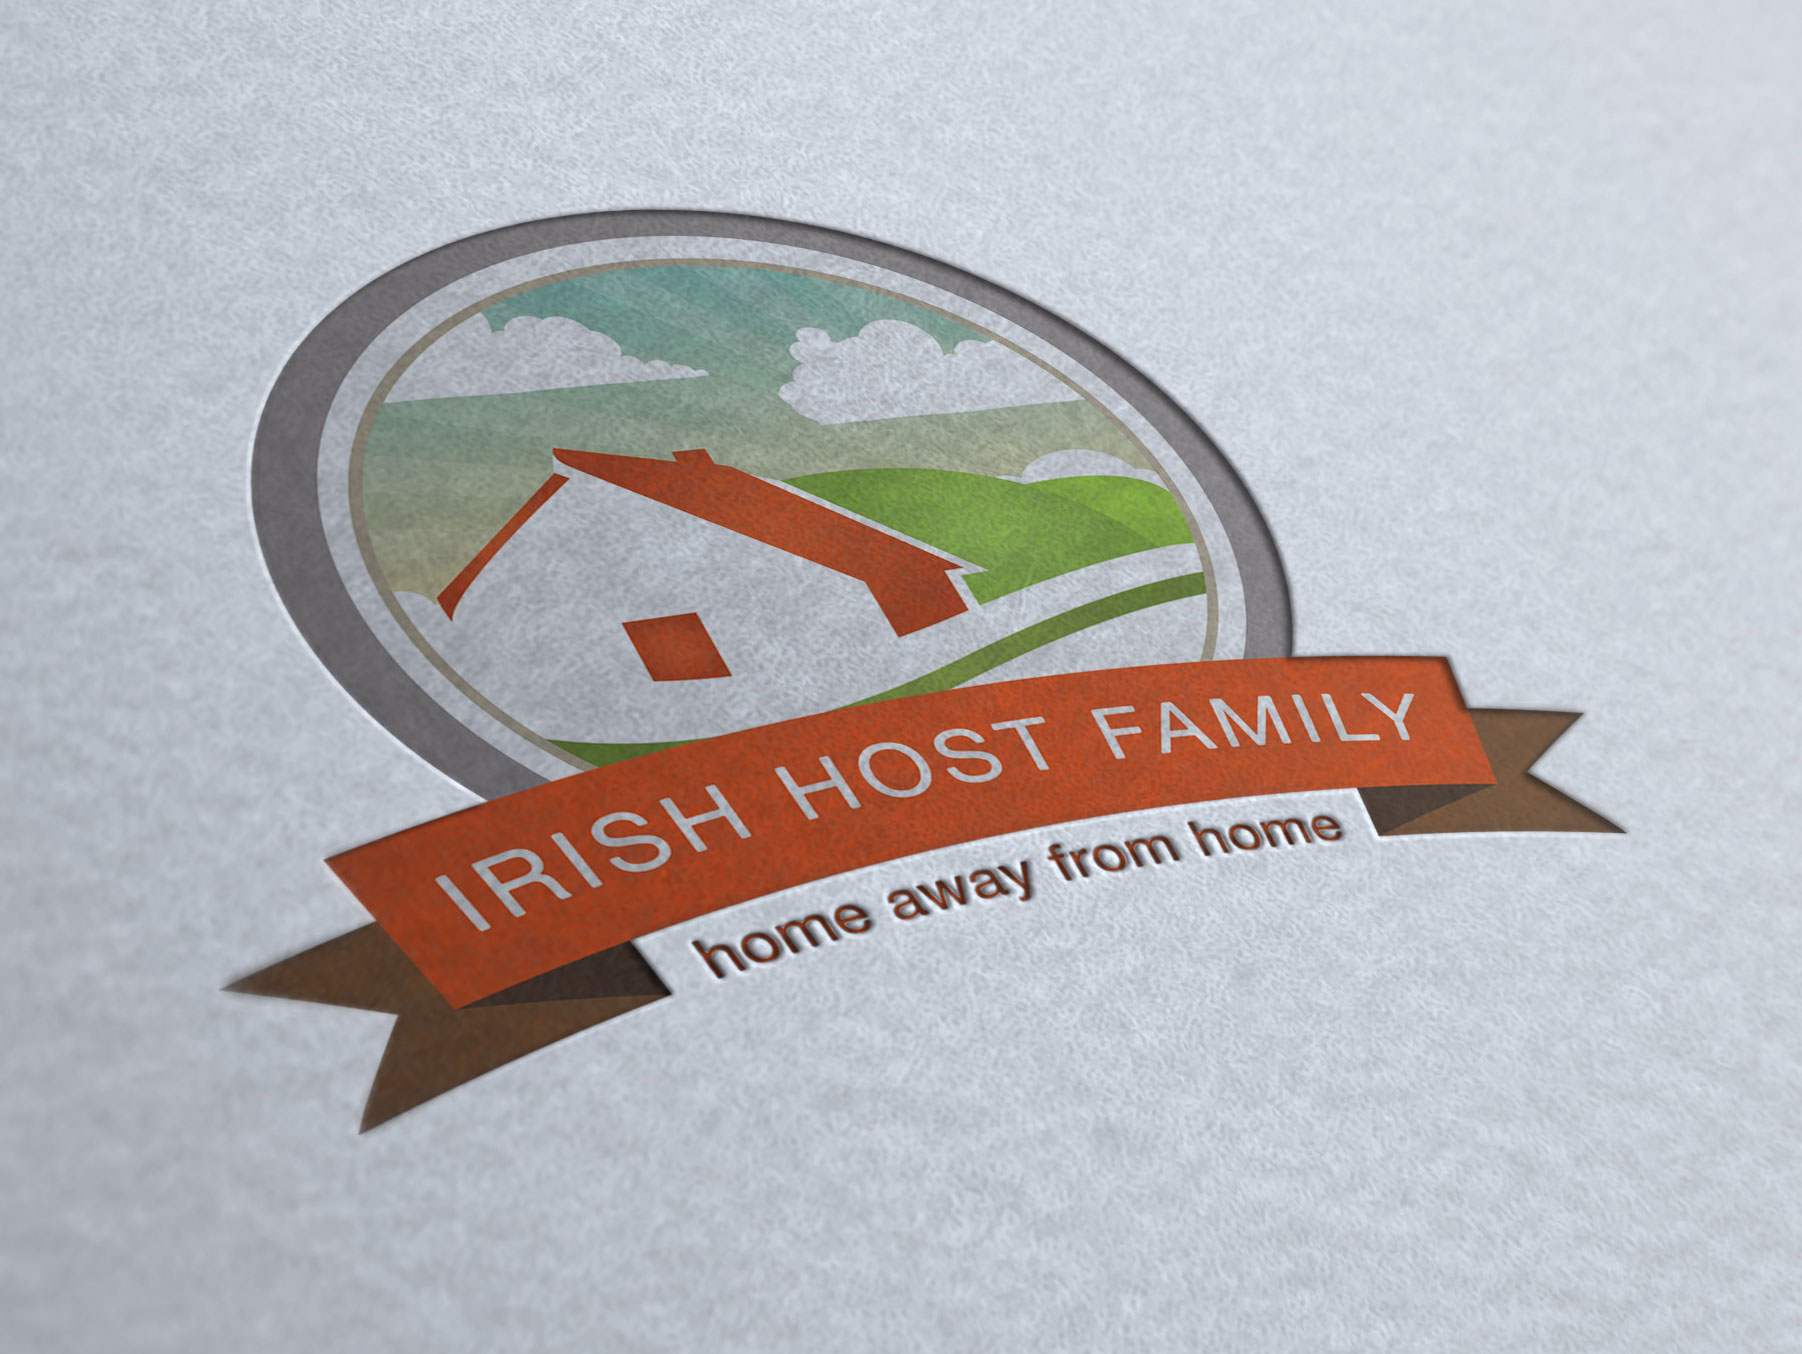 Irish Host Family logo design